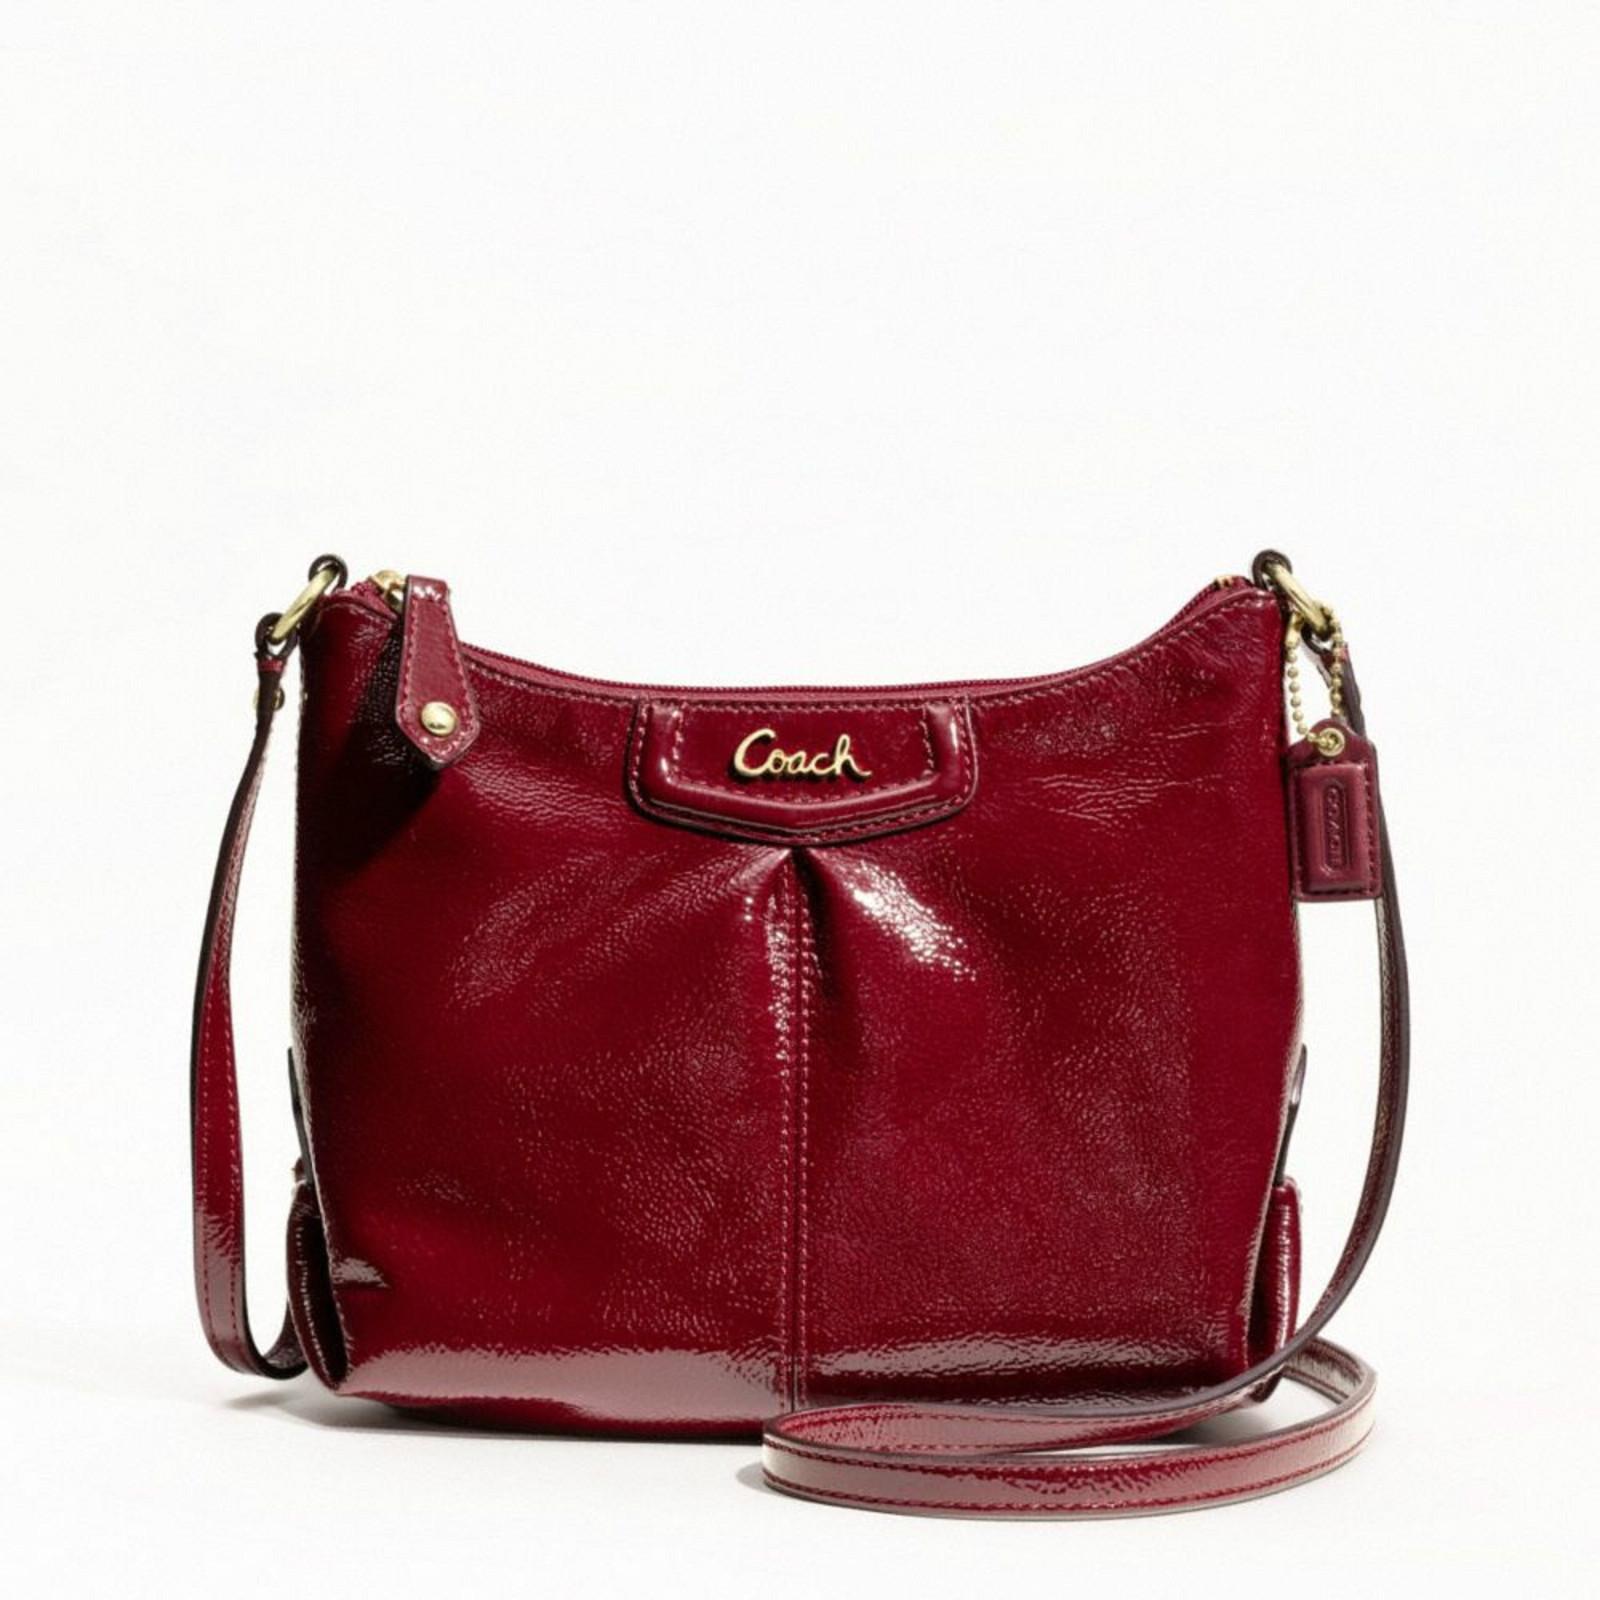 ce38eb28bf592 ... purchase coach ashley crimson patent leather swingpack crossbody 48252  8c59f 30955